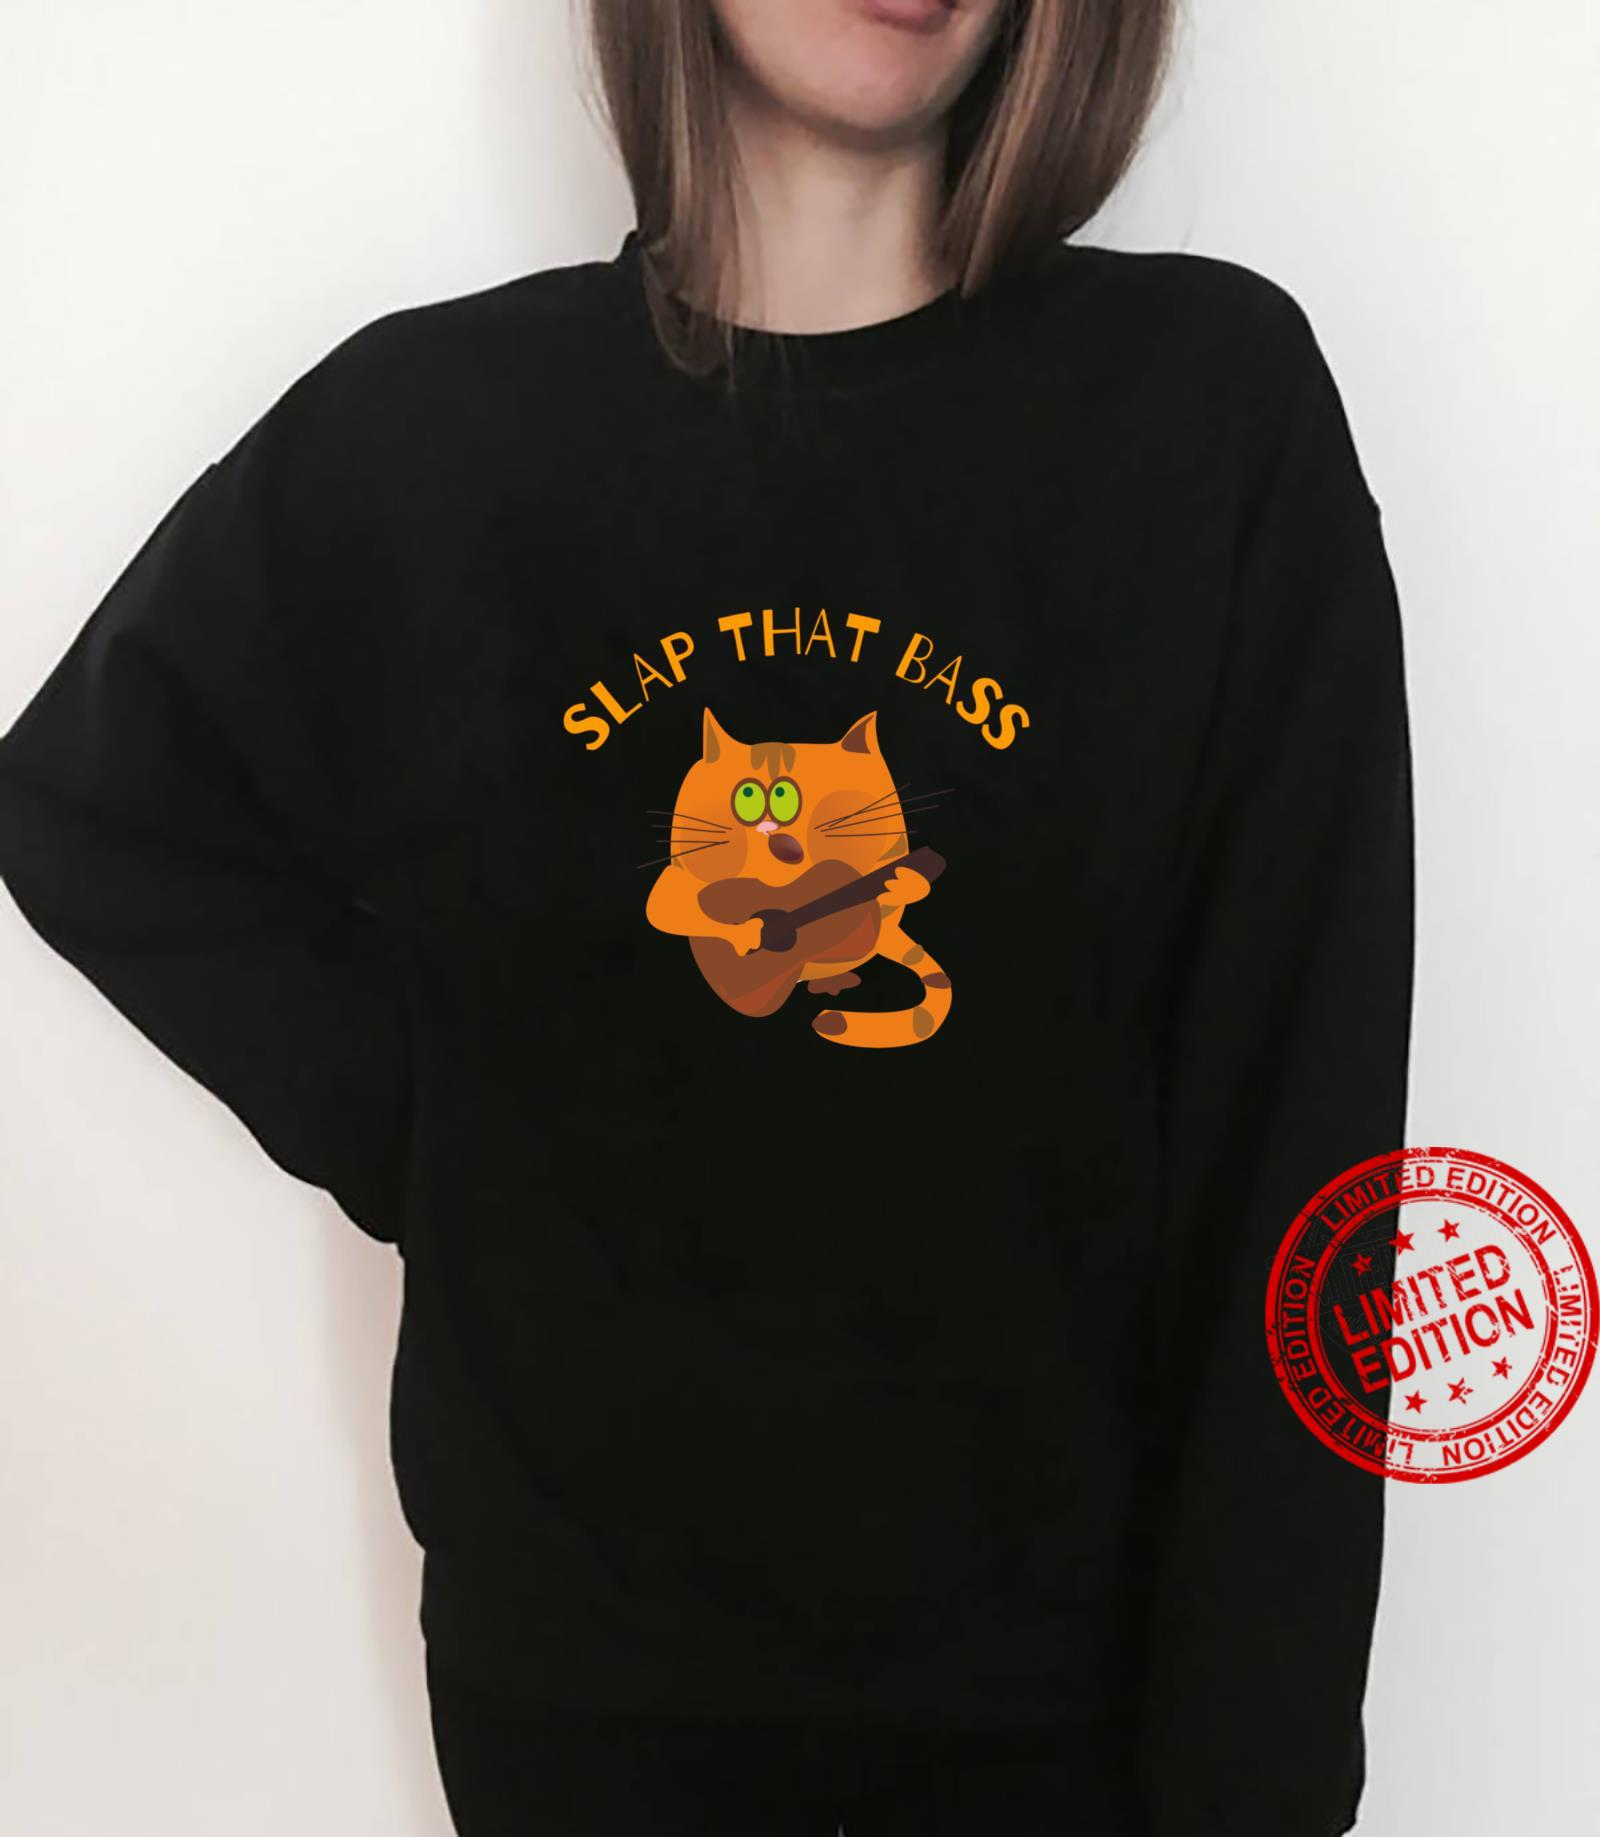 Slap That Bass featuring bass playing kitty cat Shirt sweater